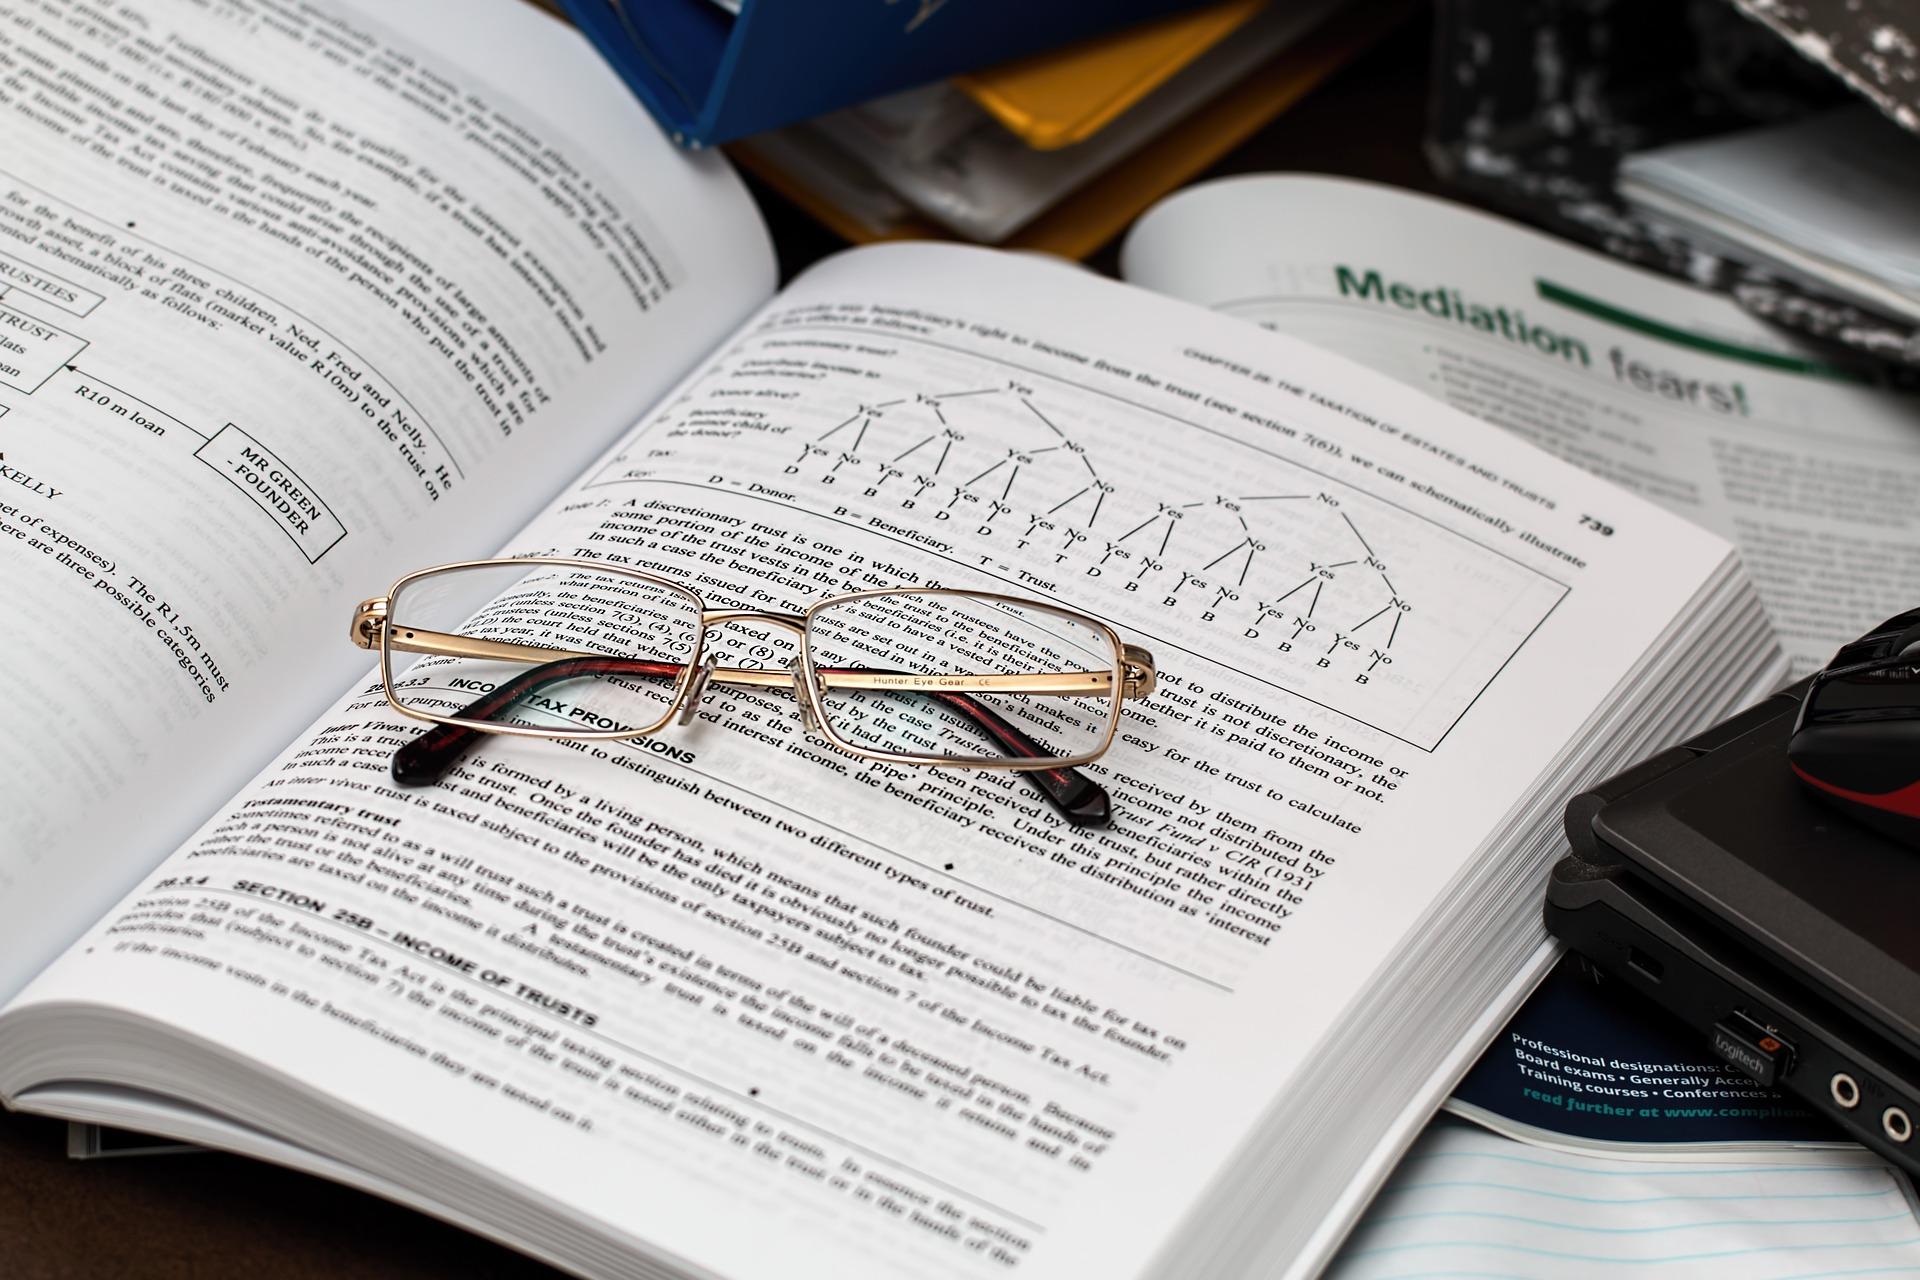 איך בוחרים עורך דין למס הכנסה?